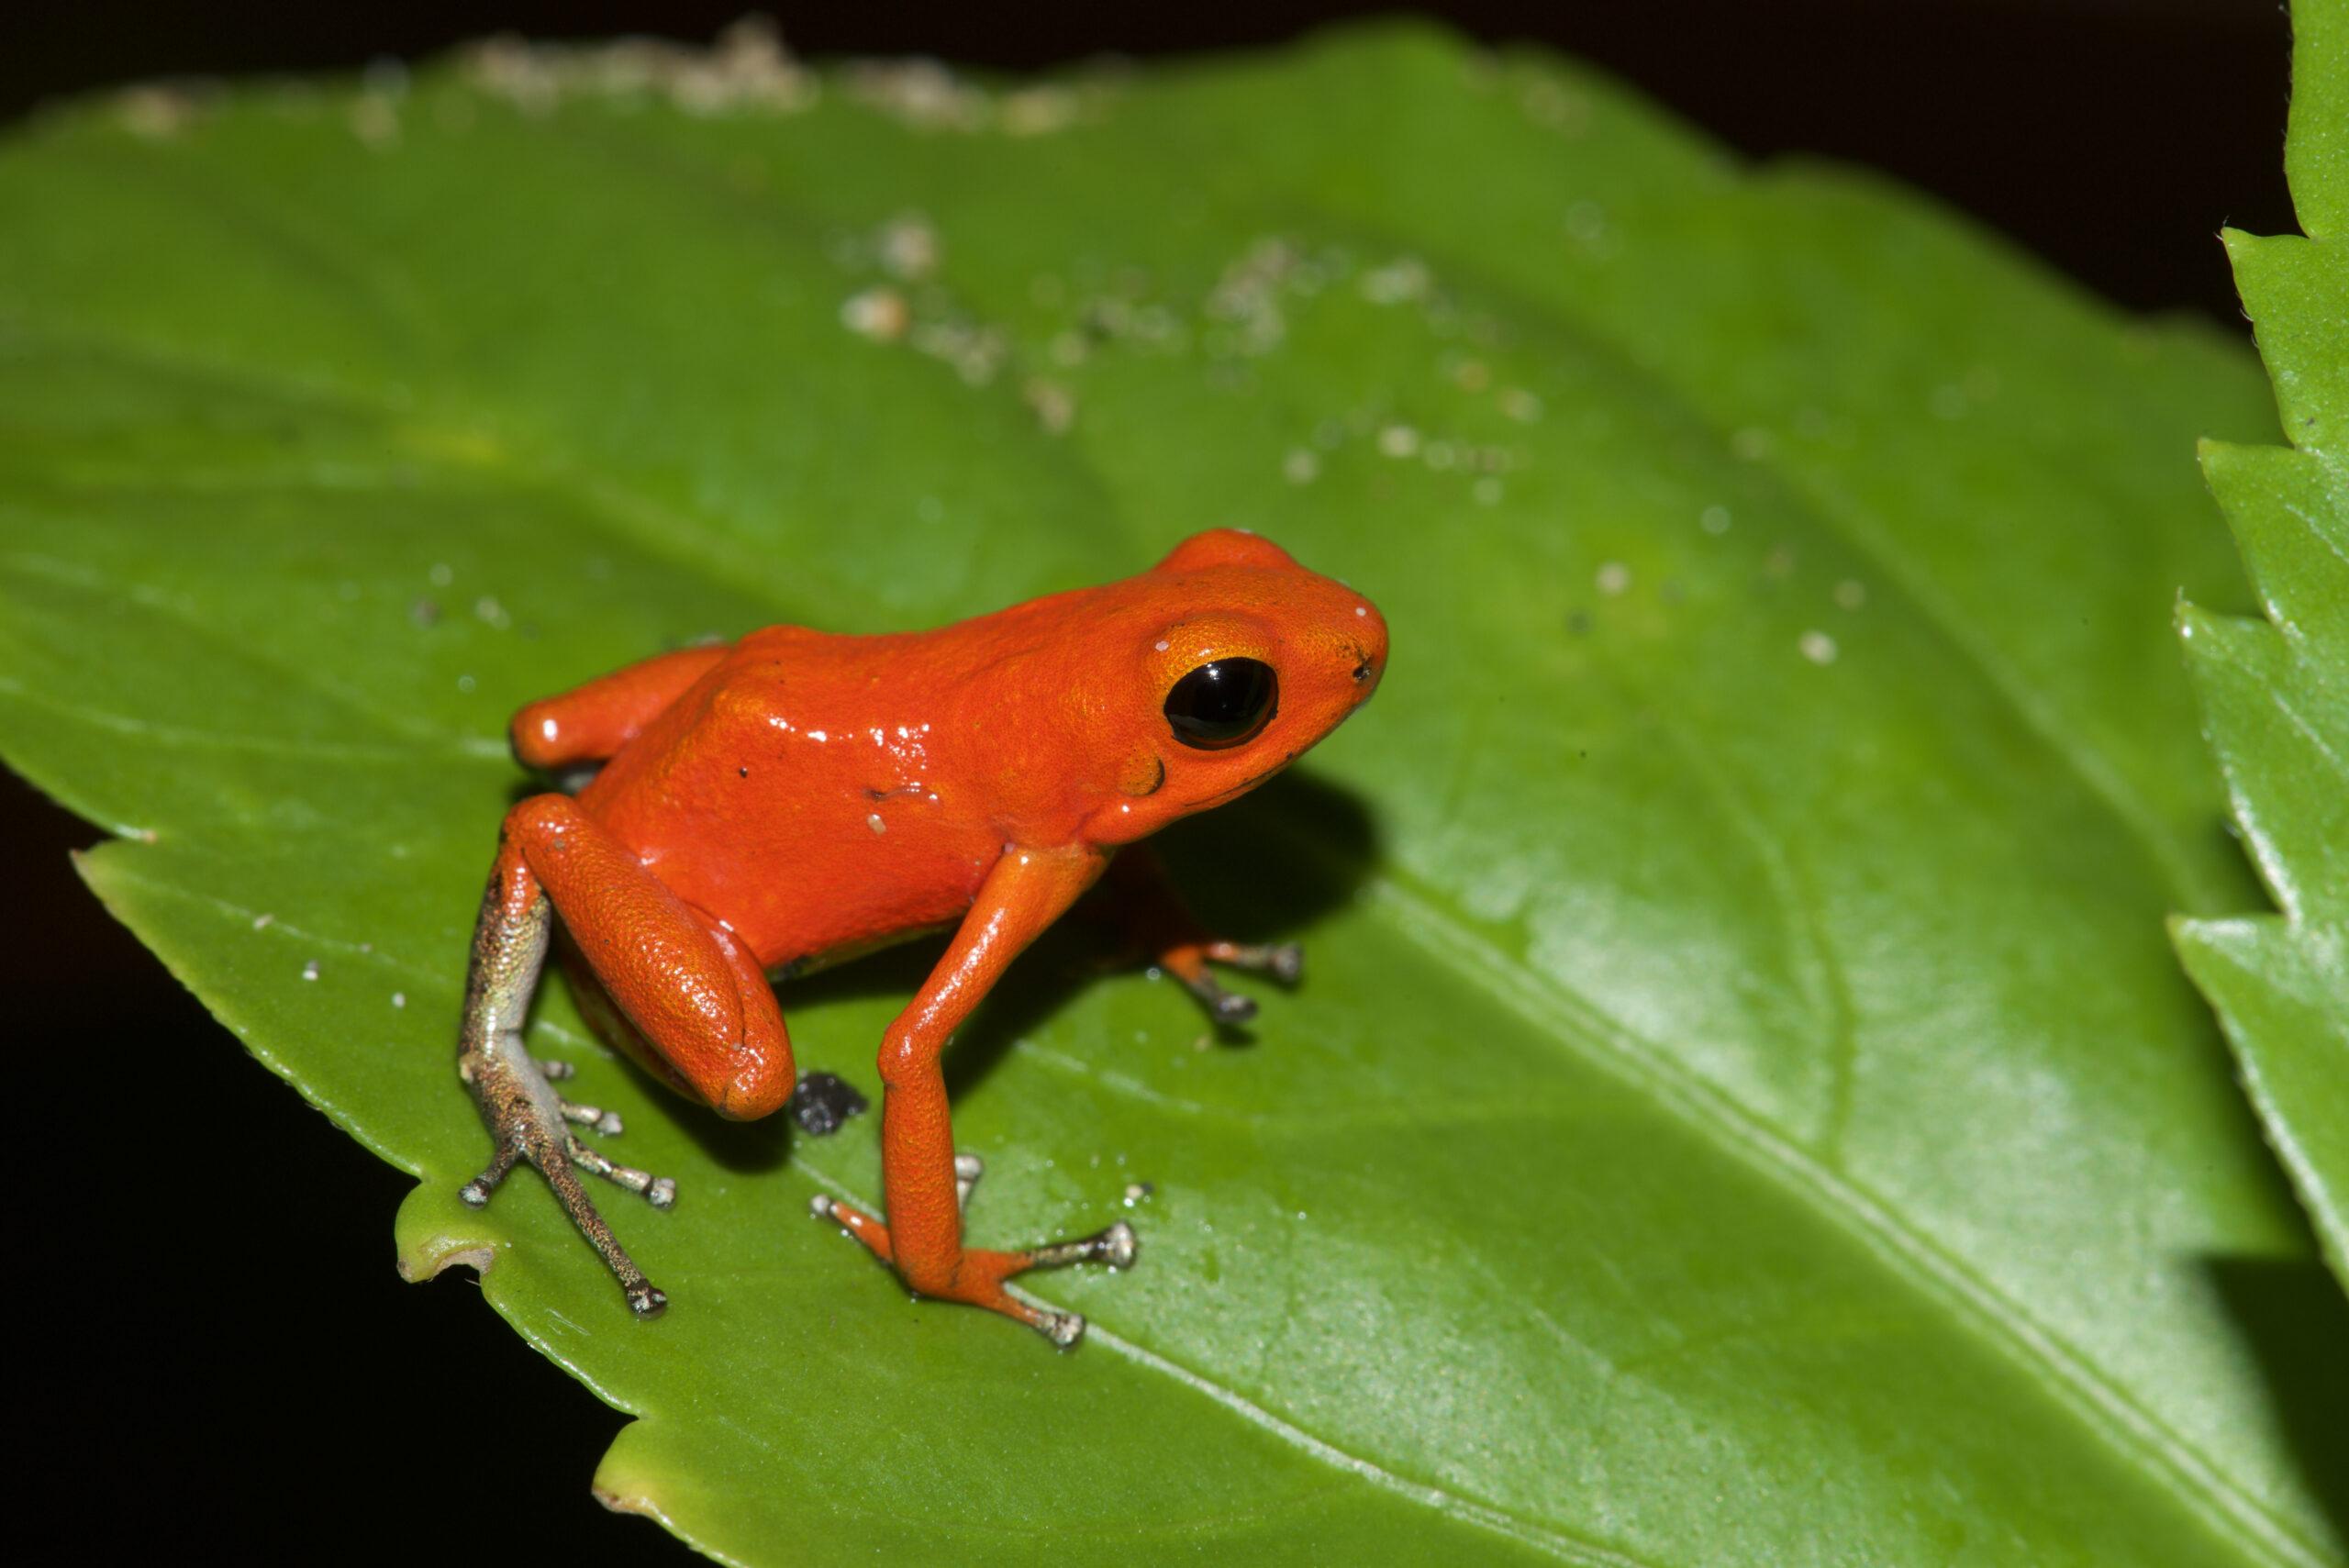 Oophaga pumilio from Isla Solarte, Bocas del Toro, Panama - by E. Van Heygen.